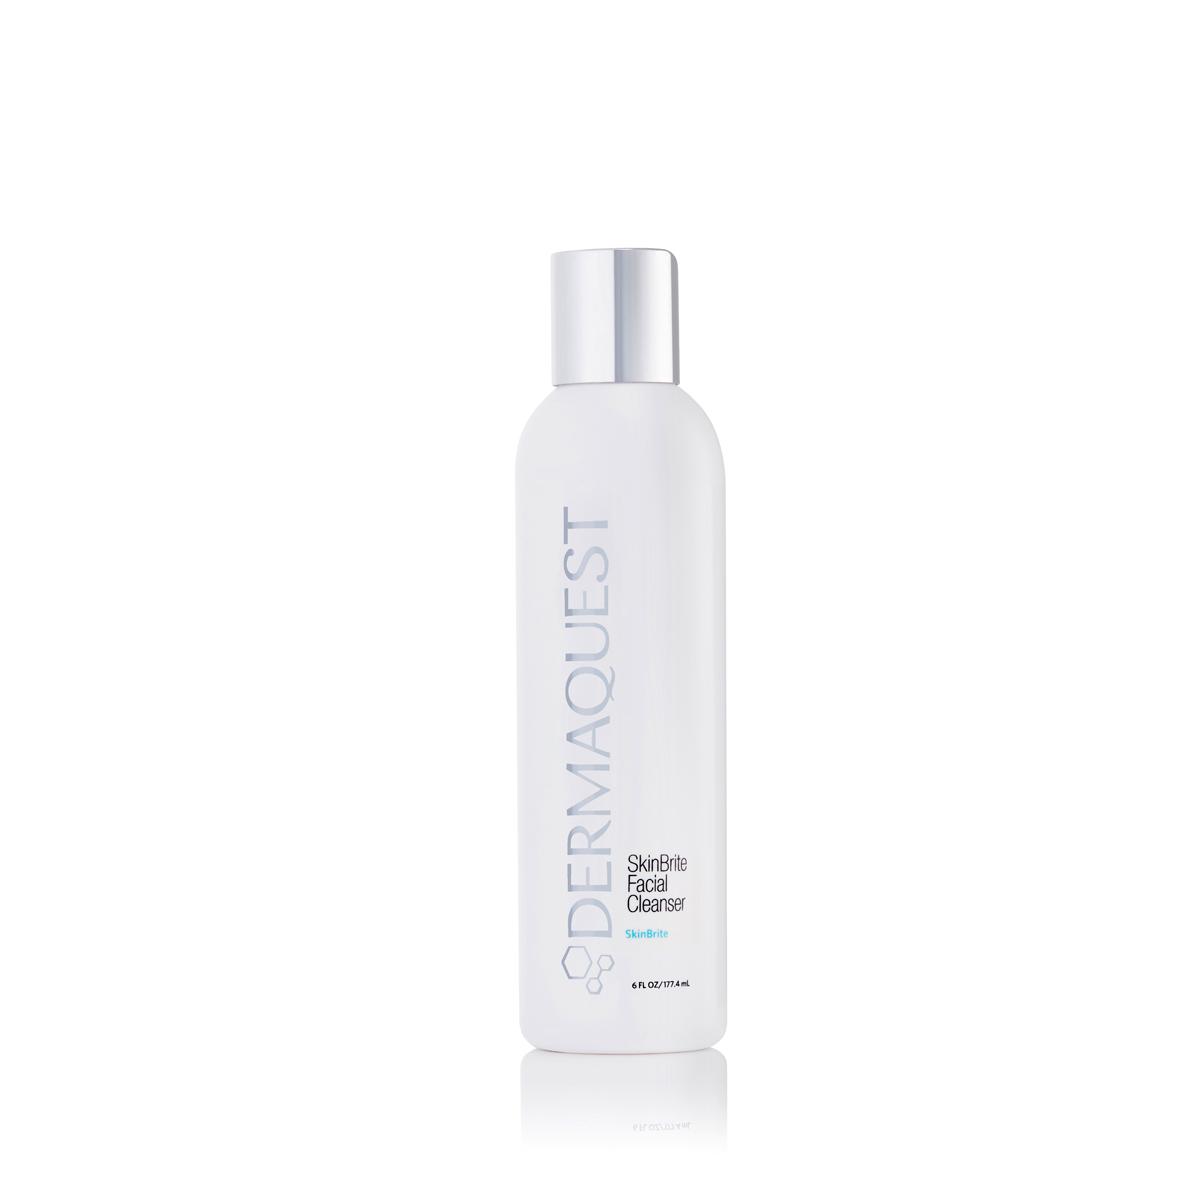 Skinbrite Facial Cleanser – Skinbrite